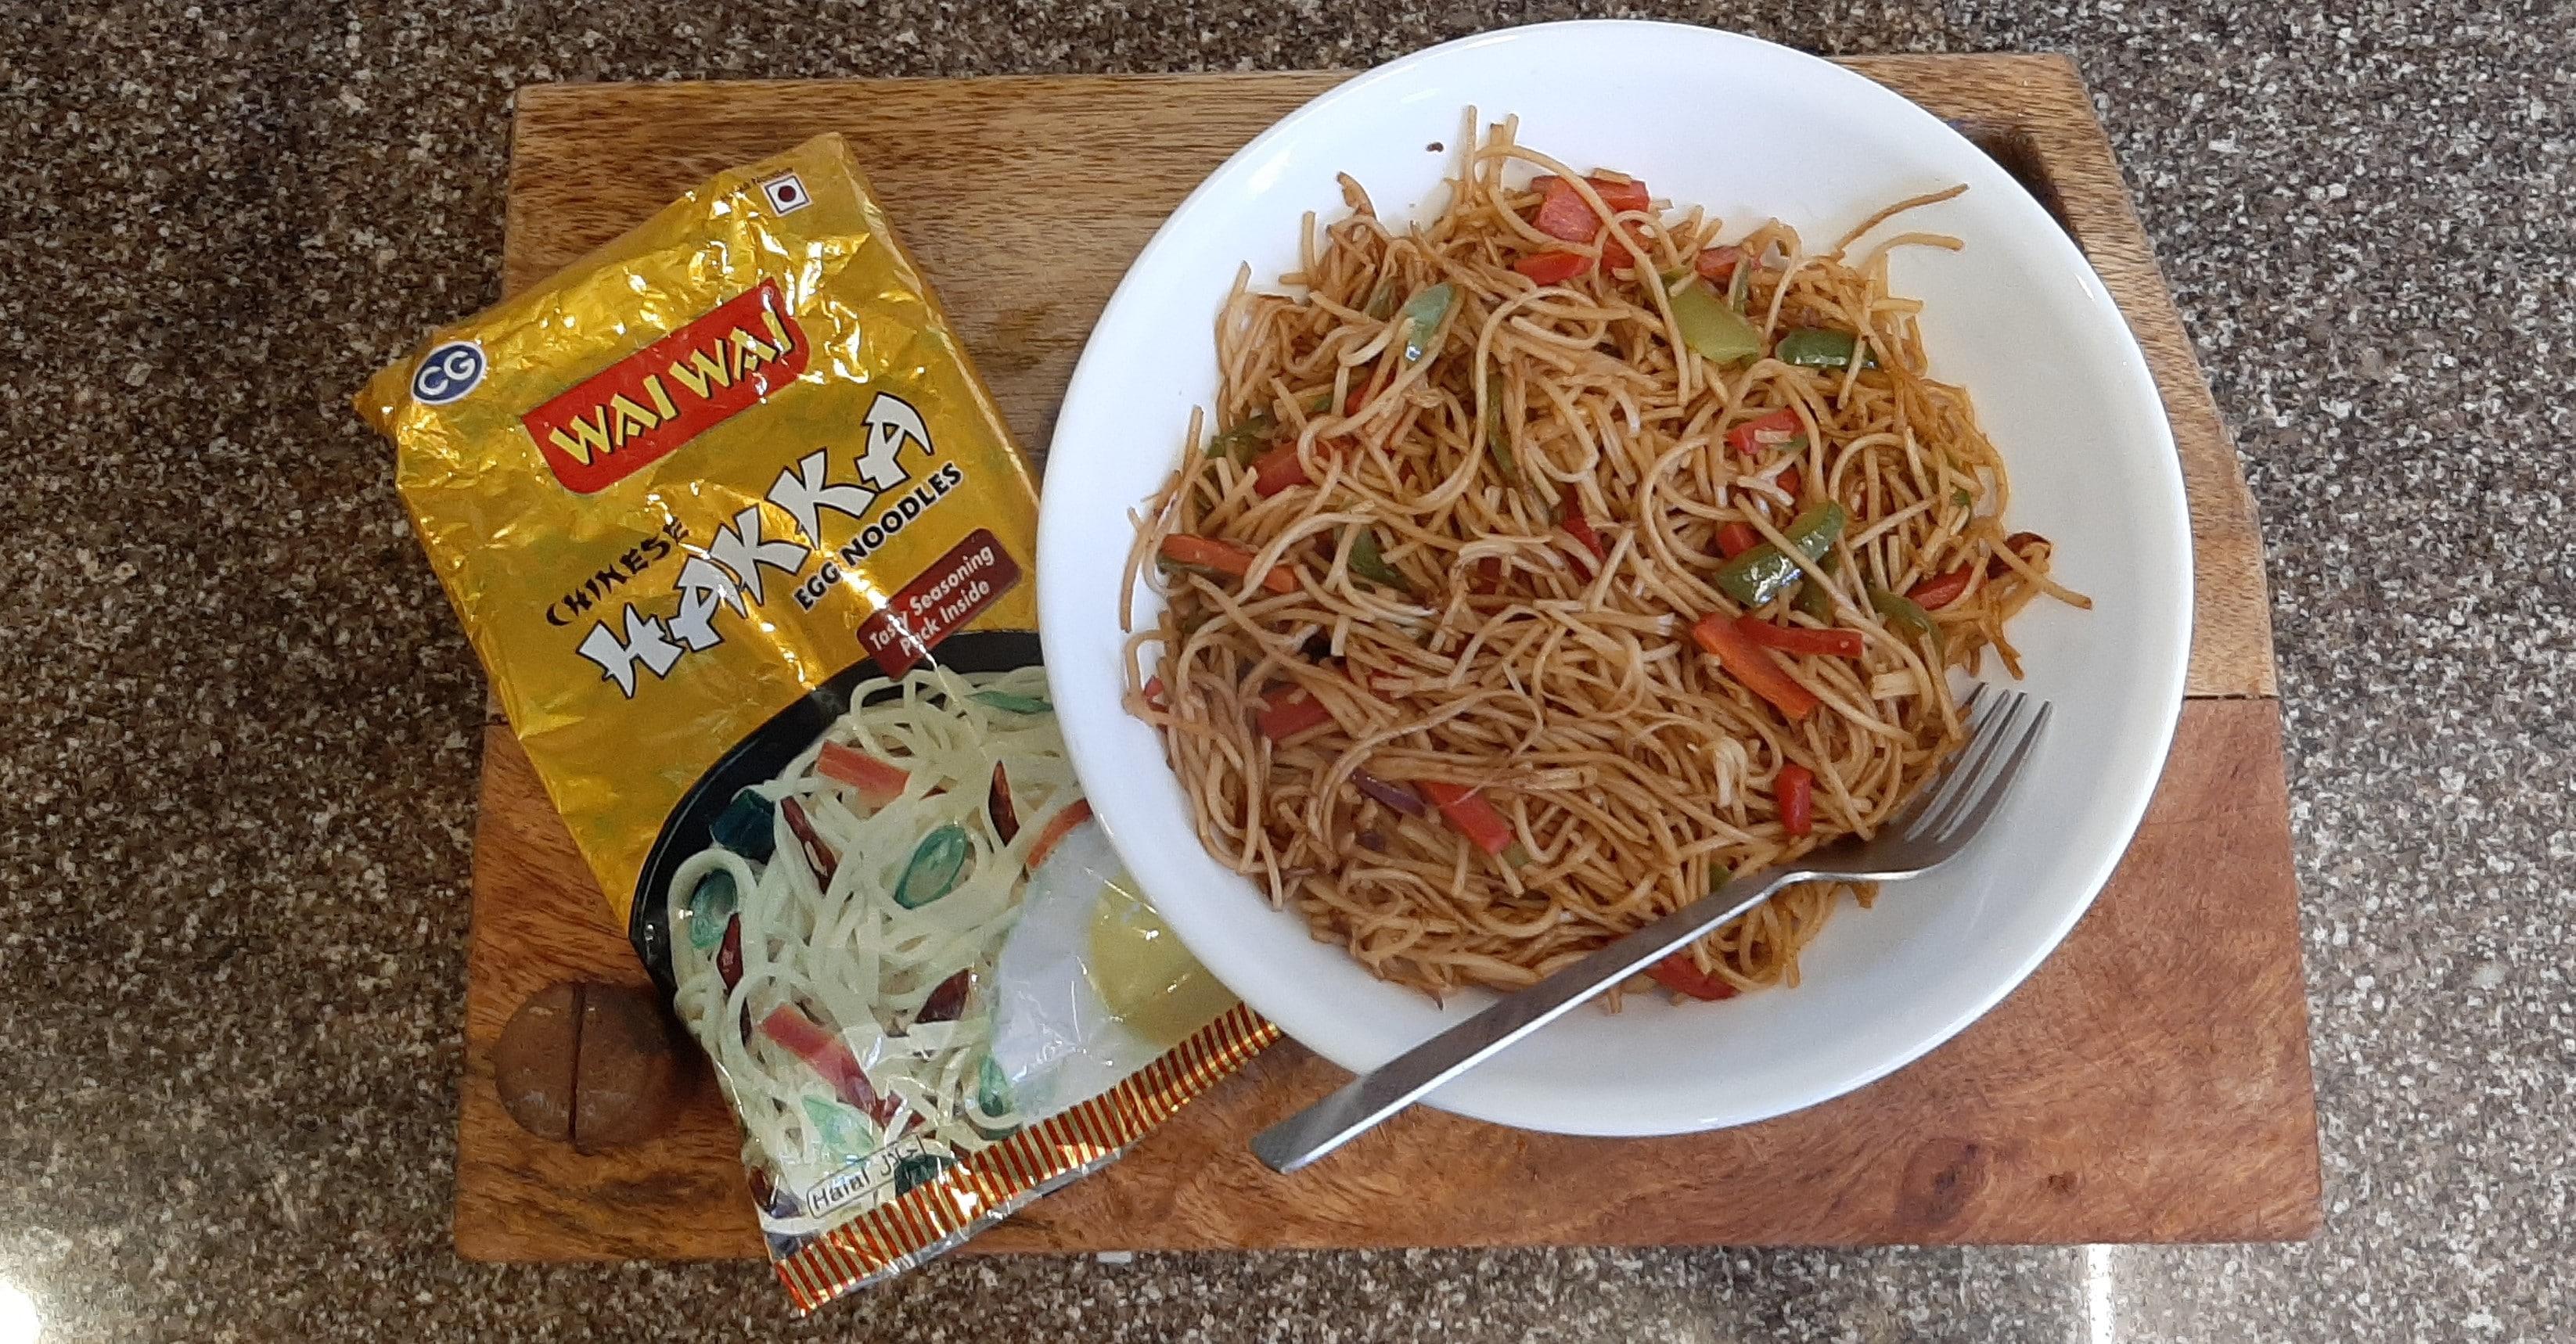 Top Wai Wai Chinese Hakka Egg Noodles Review